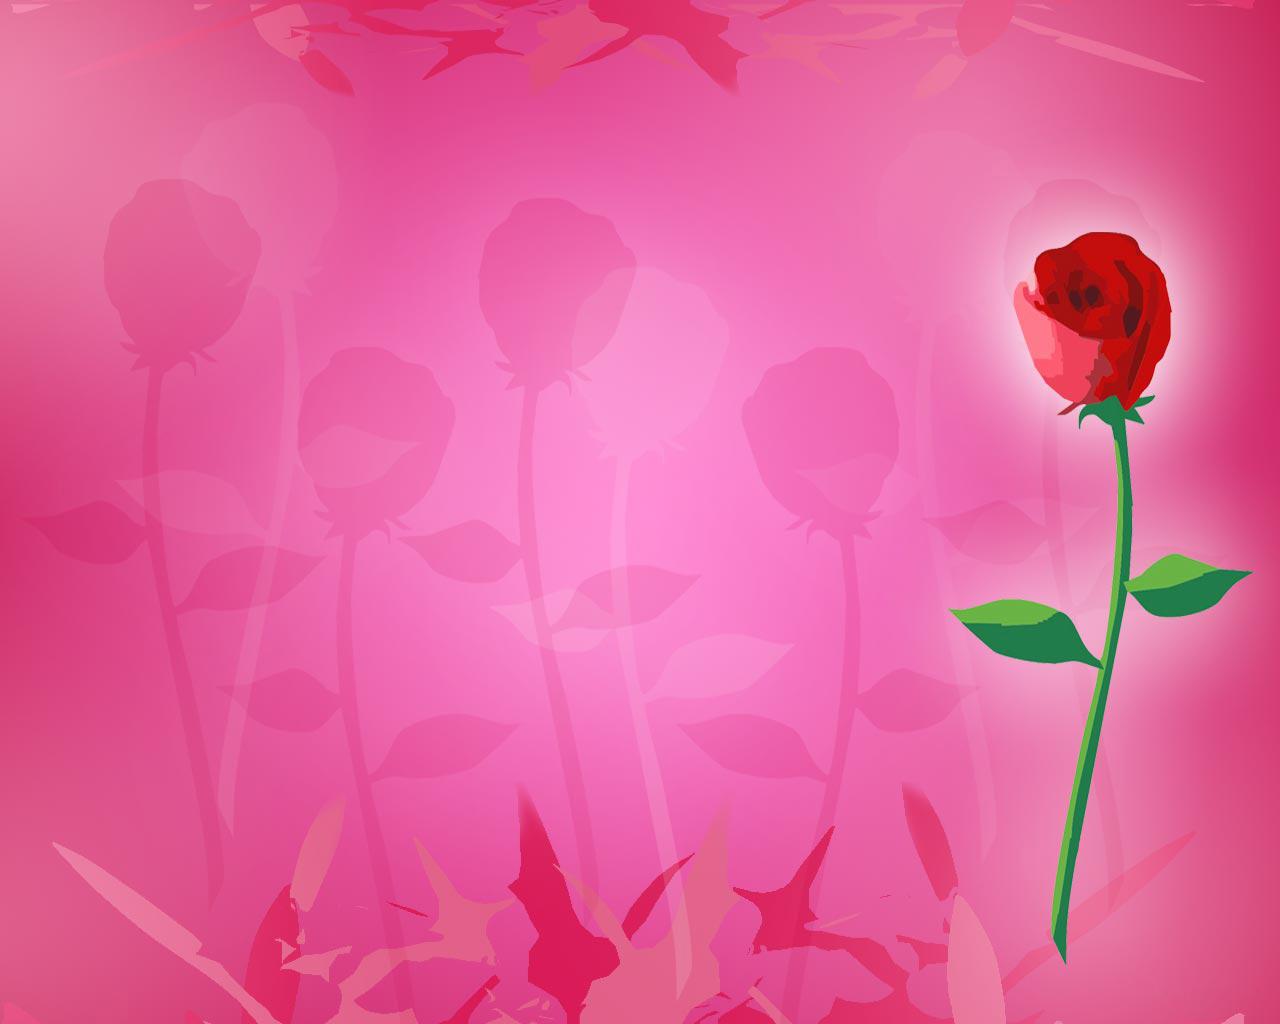 Background powerpoint hoa hồng